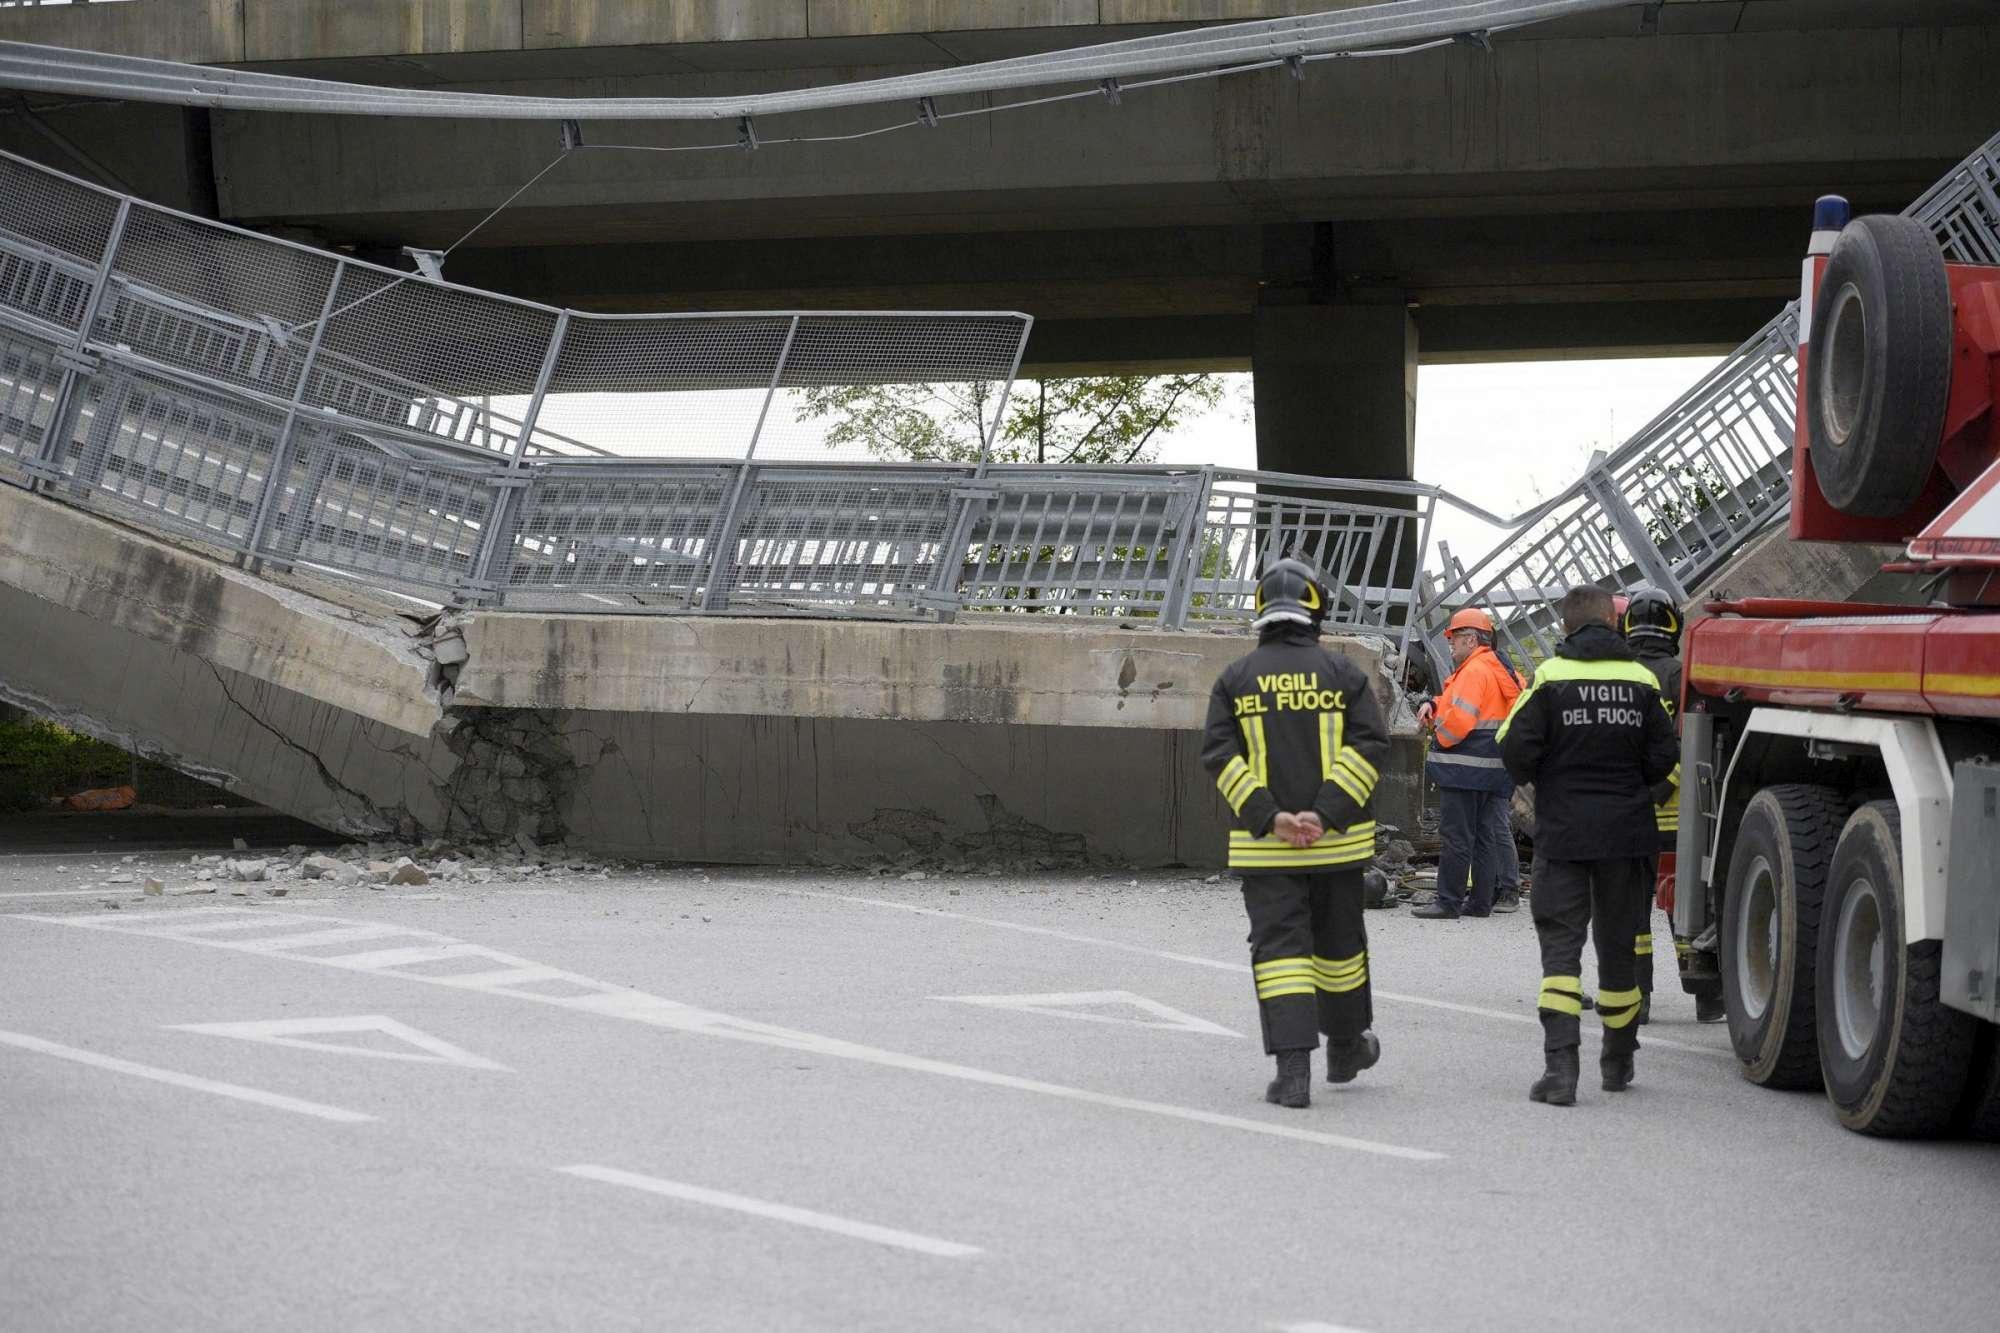 Cavalcavia crolla su un'auto dei carabinieri nel Cuneese